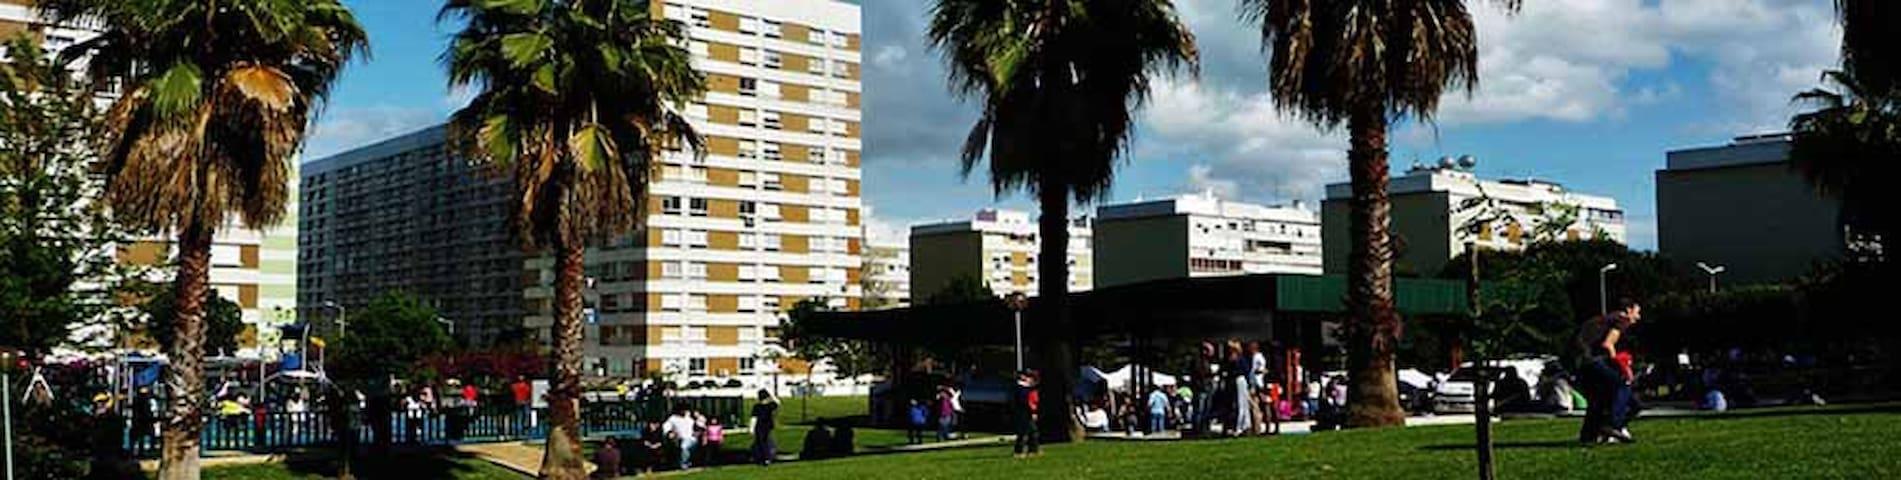 Portela's Nearby Facilities Guidebook